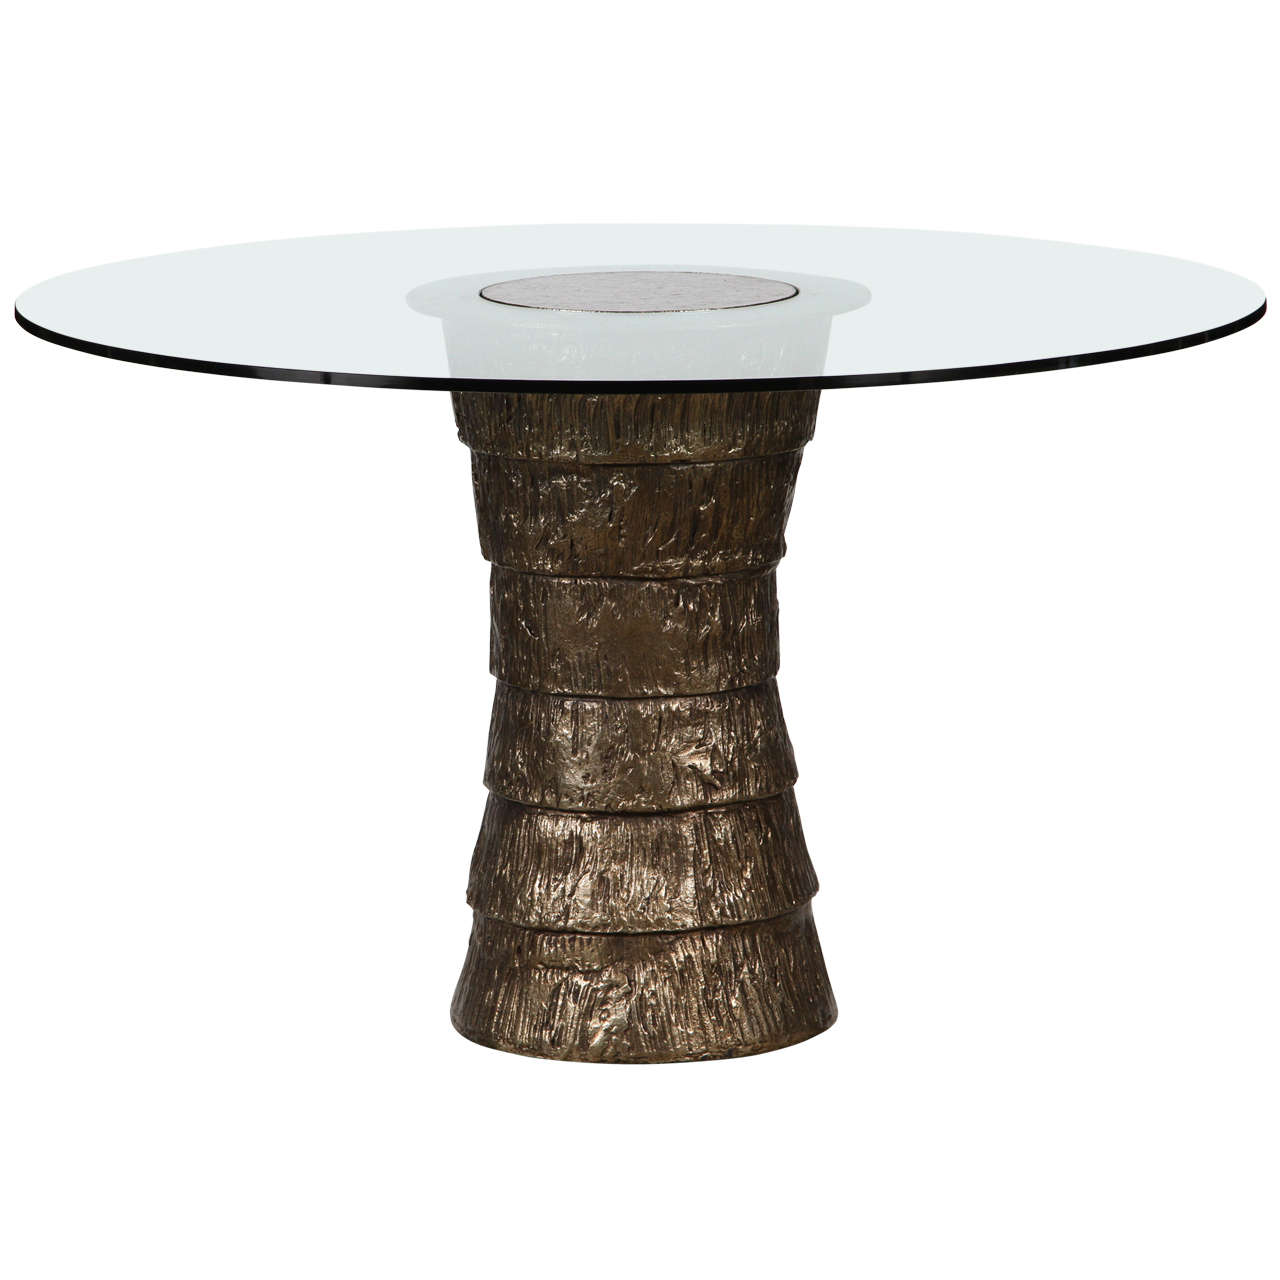 Sculptural Brutalist pedestal-style table, 21st century, offered by Paul Marra Design